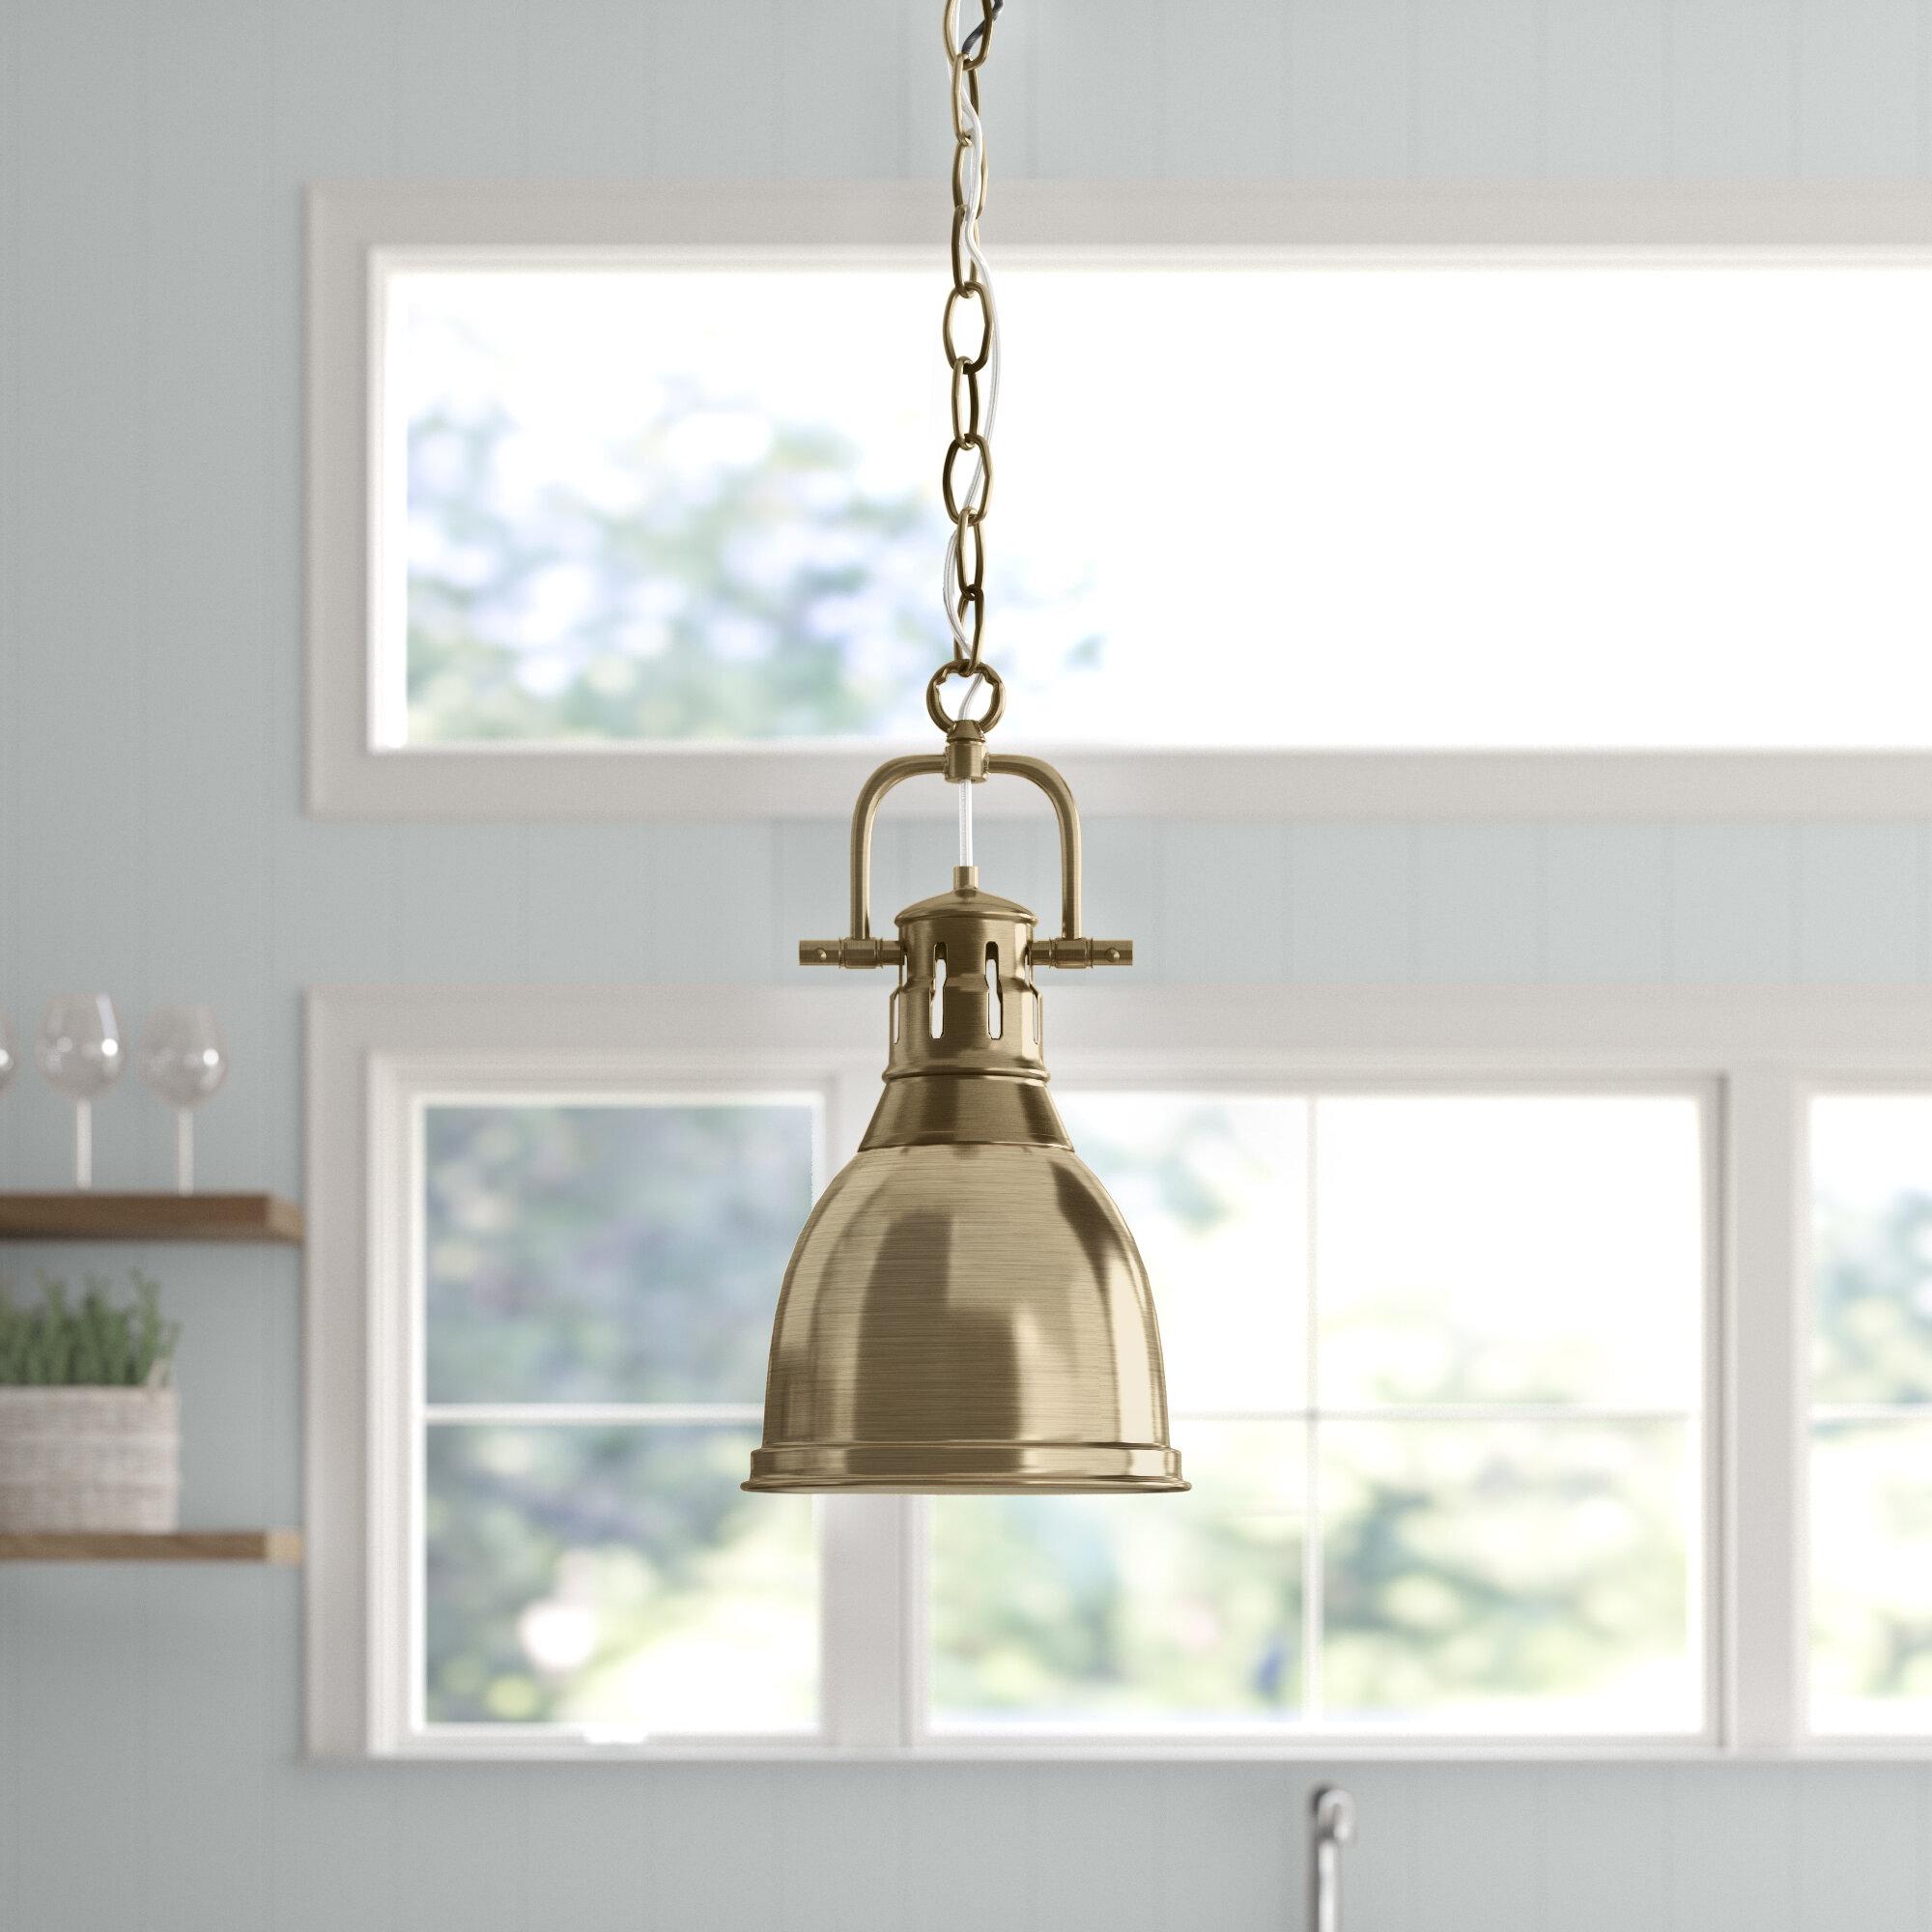 Kylo 1 Light Single Dome Pendant Reviews Joss Main